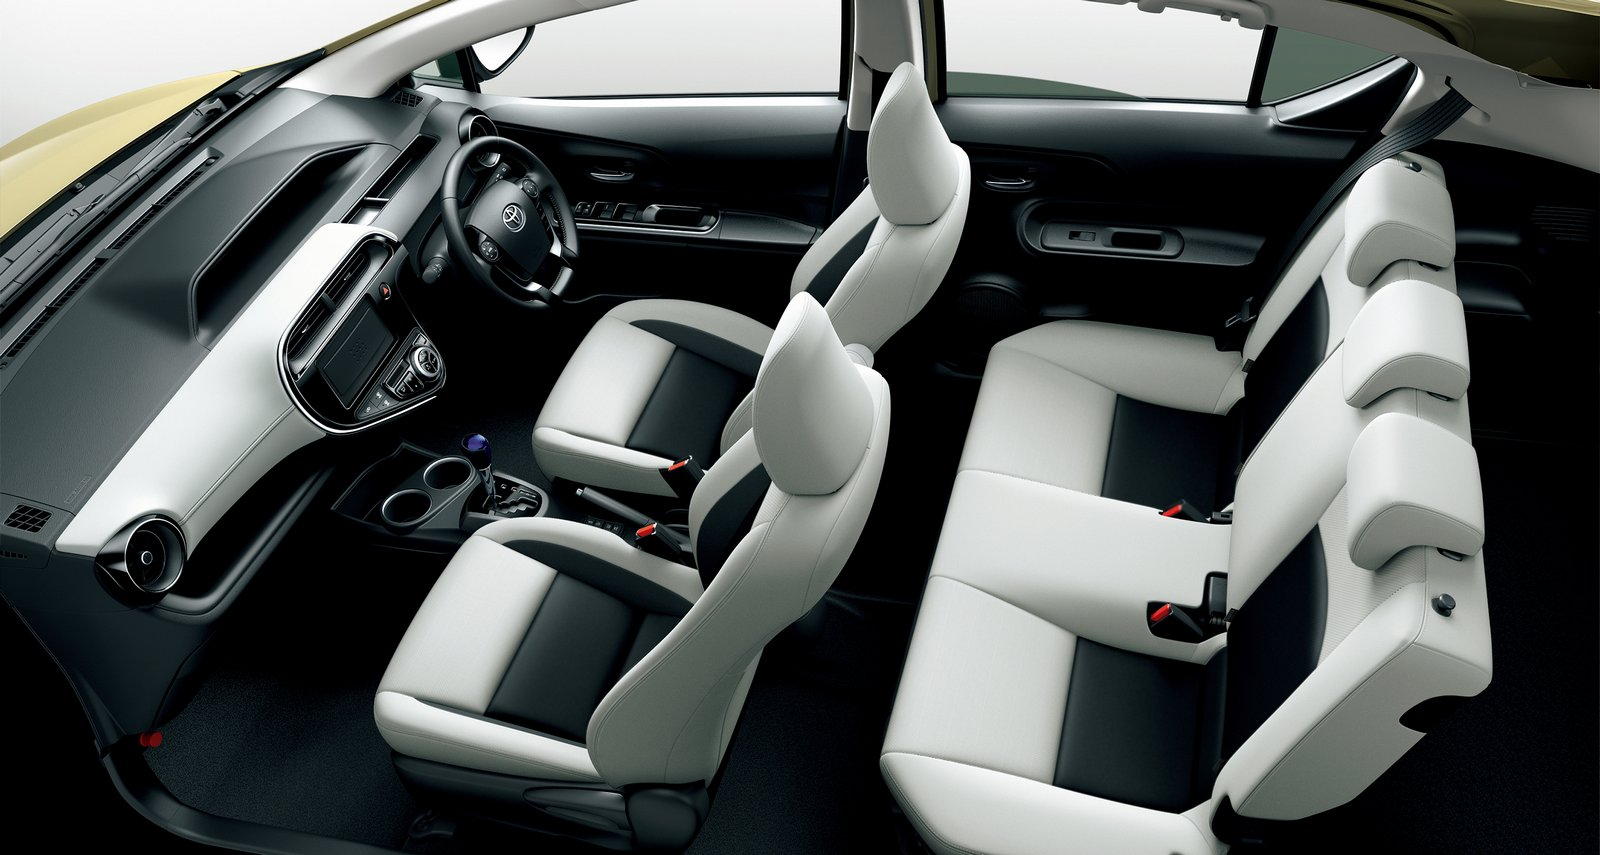 2018_Toyota_Aqua_facelift_06